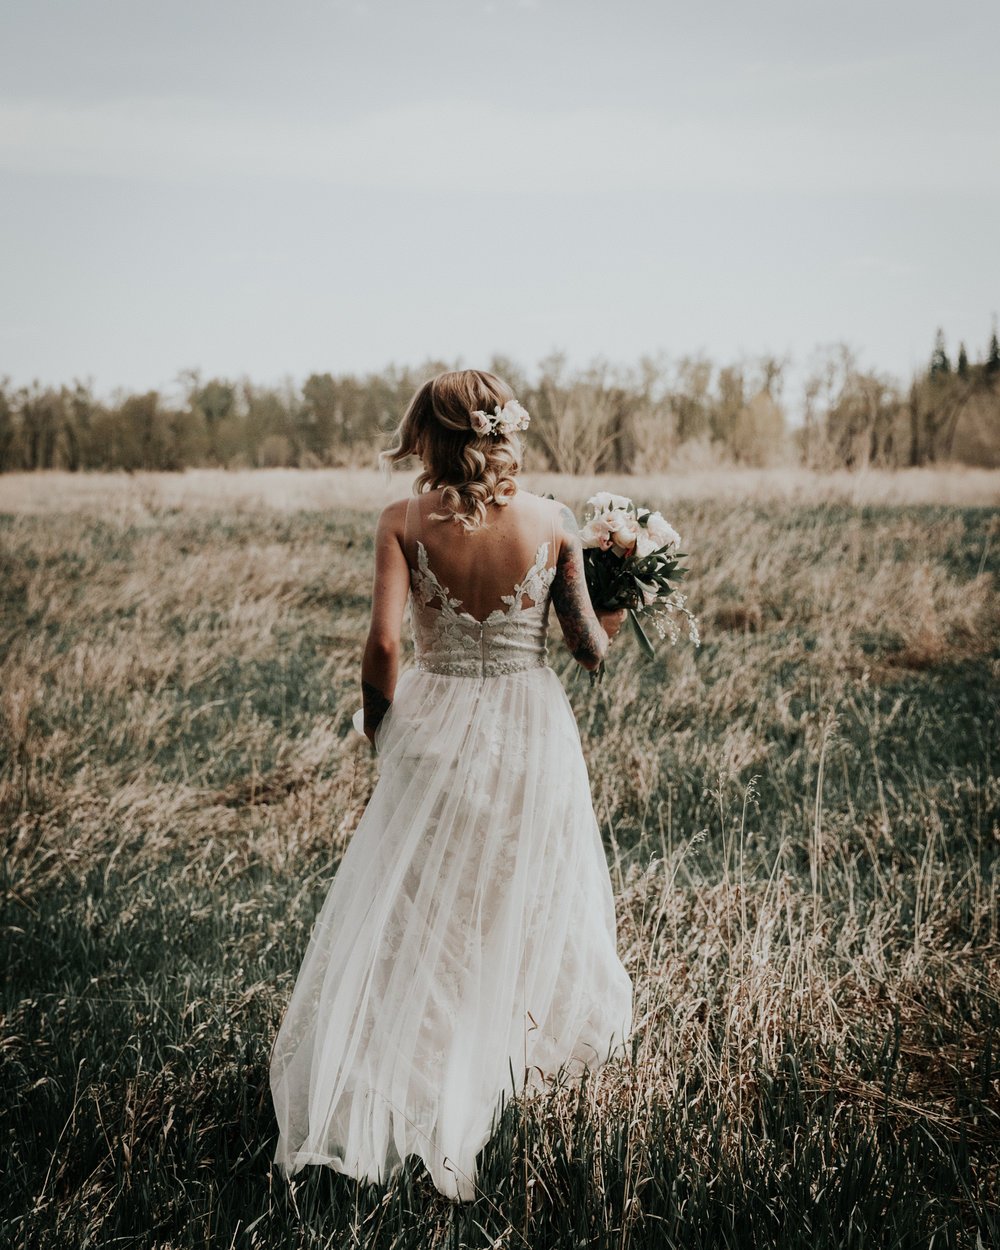 Walters Wedding Favourites - JayRMcDonald (3 of 18).JPG